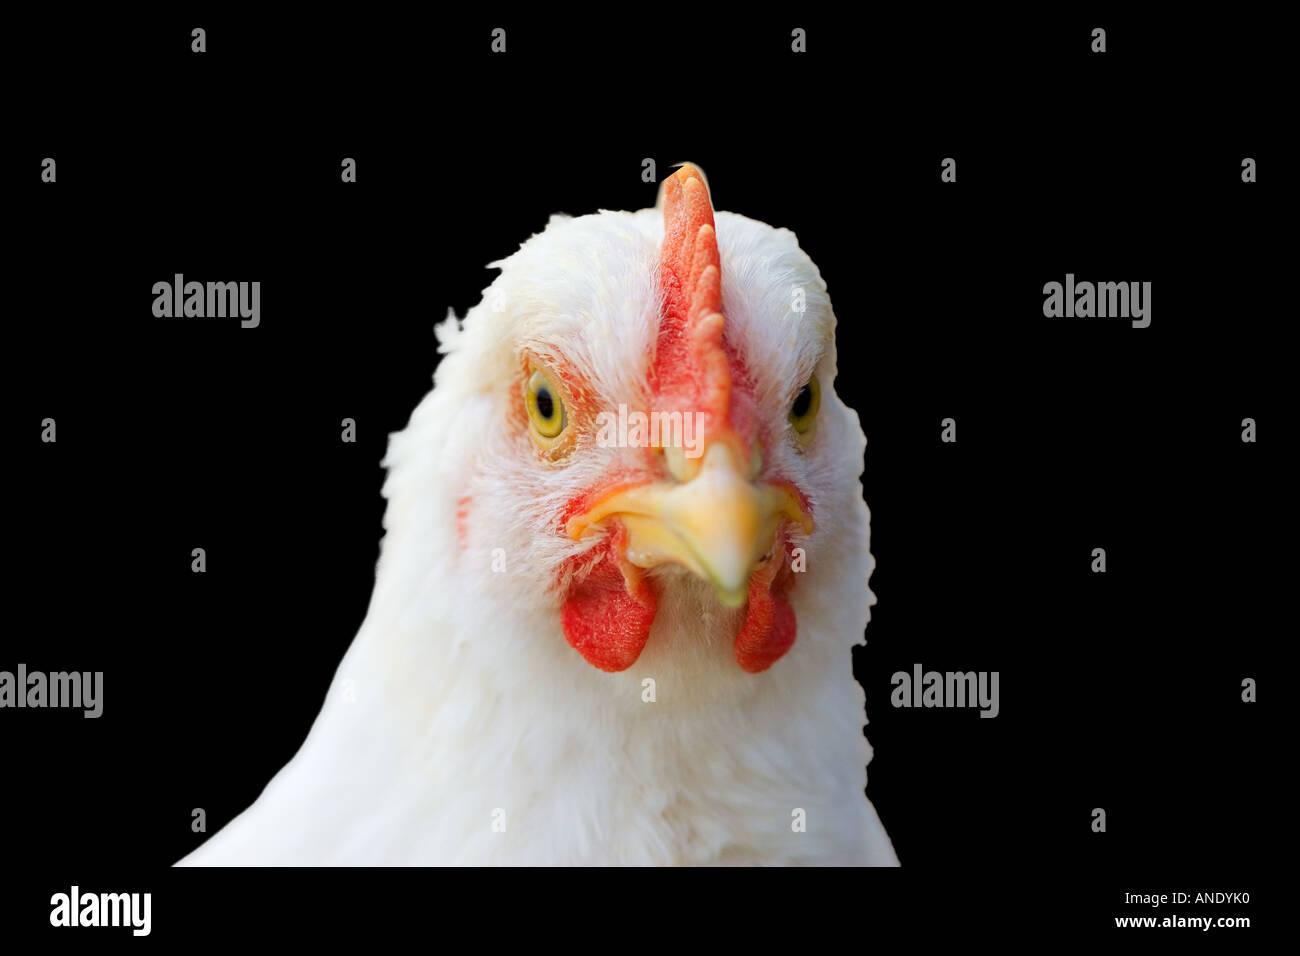 British Chicken UK Free range birds might be at risk if Avian flu bird flu virus spreads to Britain - Stock Image